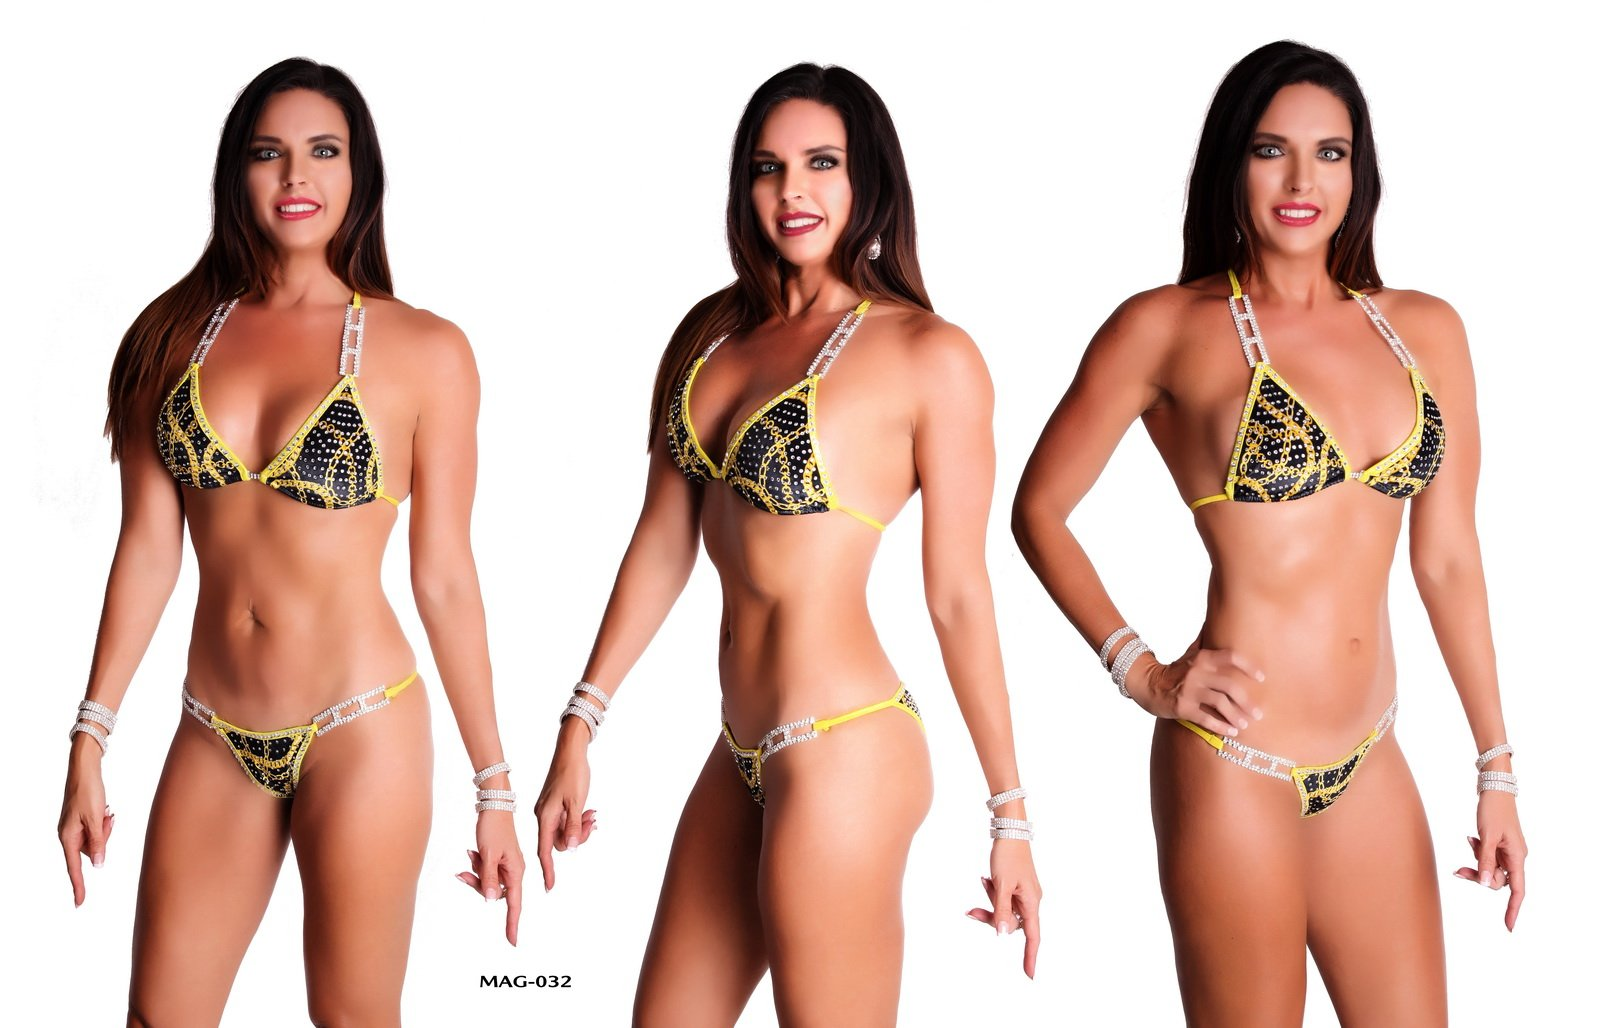 Elegantfitt Competition Bikini Suit wtih 5 Connectors and Swarovski Imitation Crystals